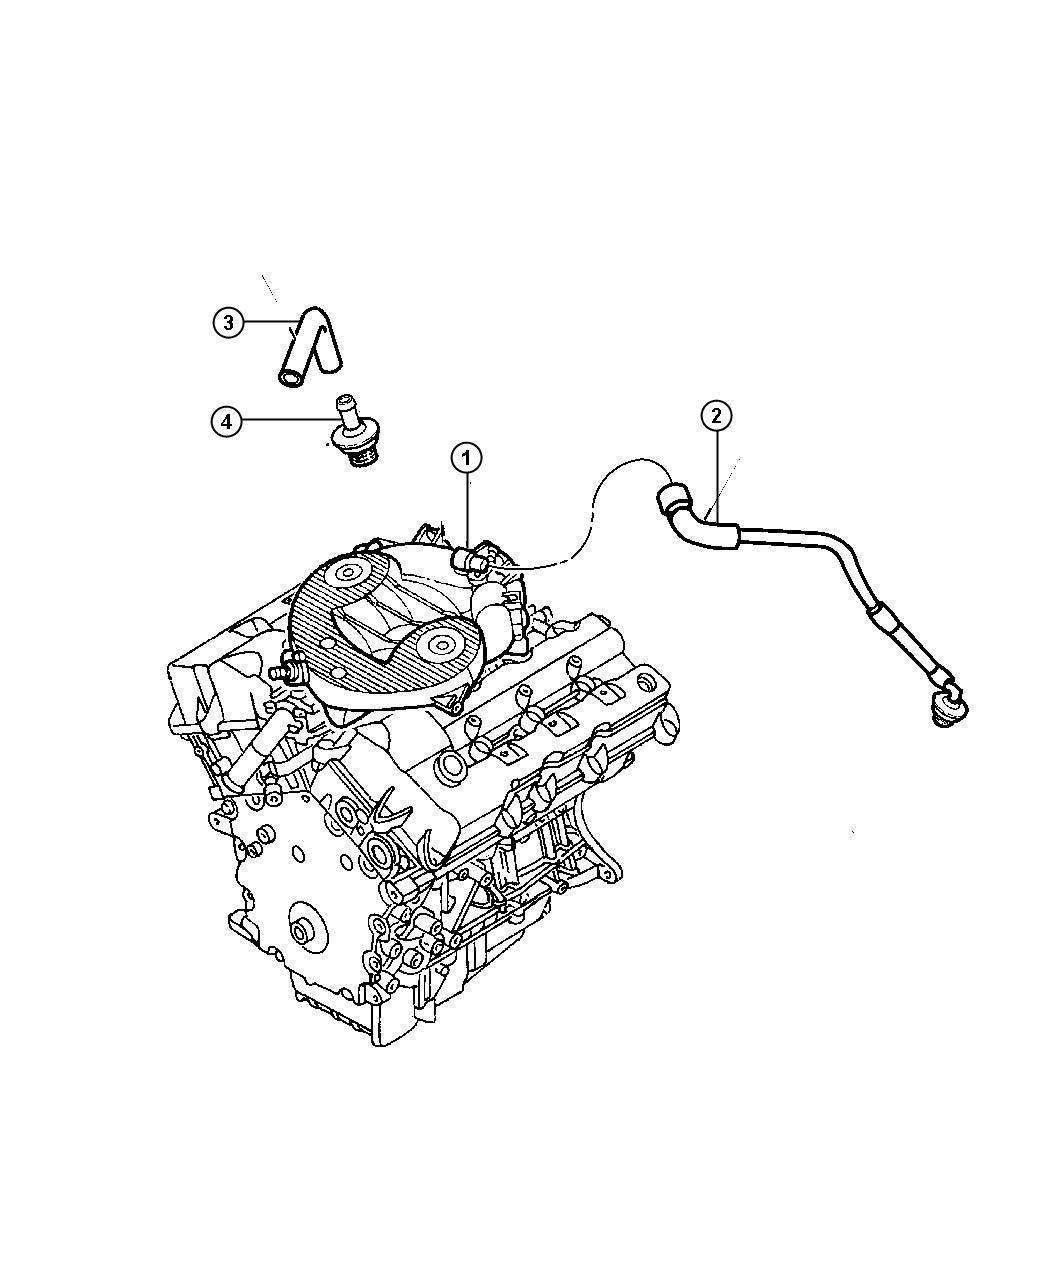 Chrysler Sebring Crankcase Ventilation